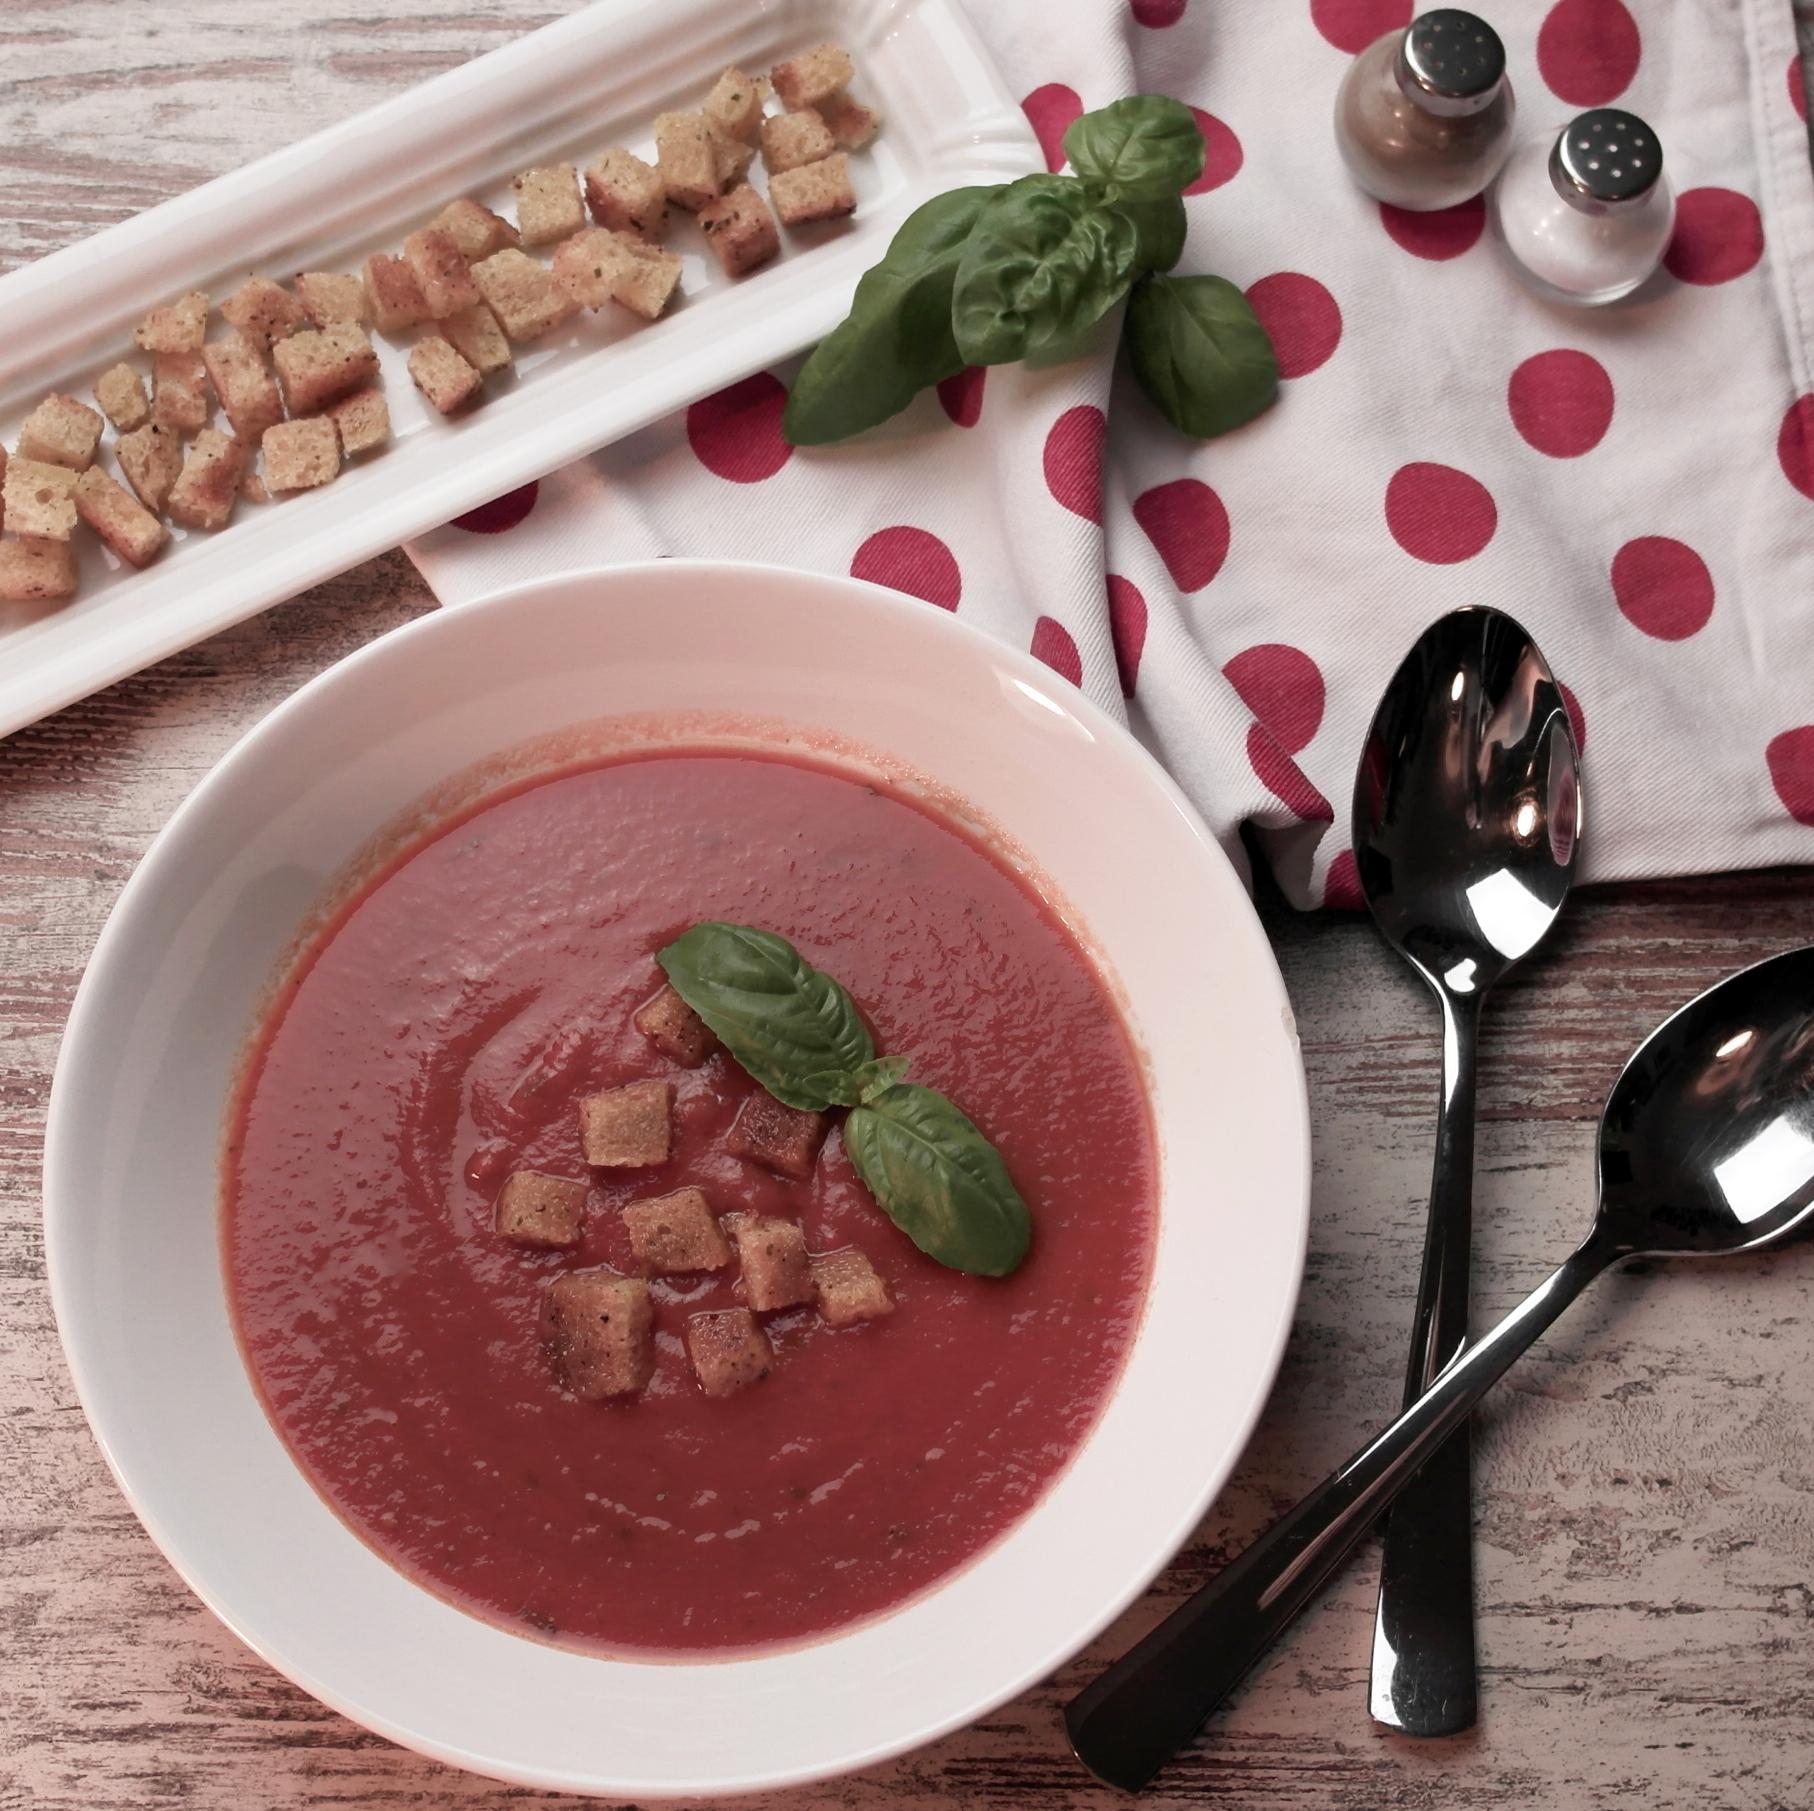 fruchtige tomatensuppe mit knusprigen croûtons | fruity tomato soup with crispy croutons (vegan) ❤